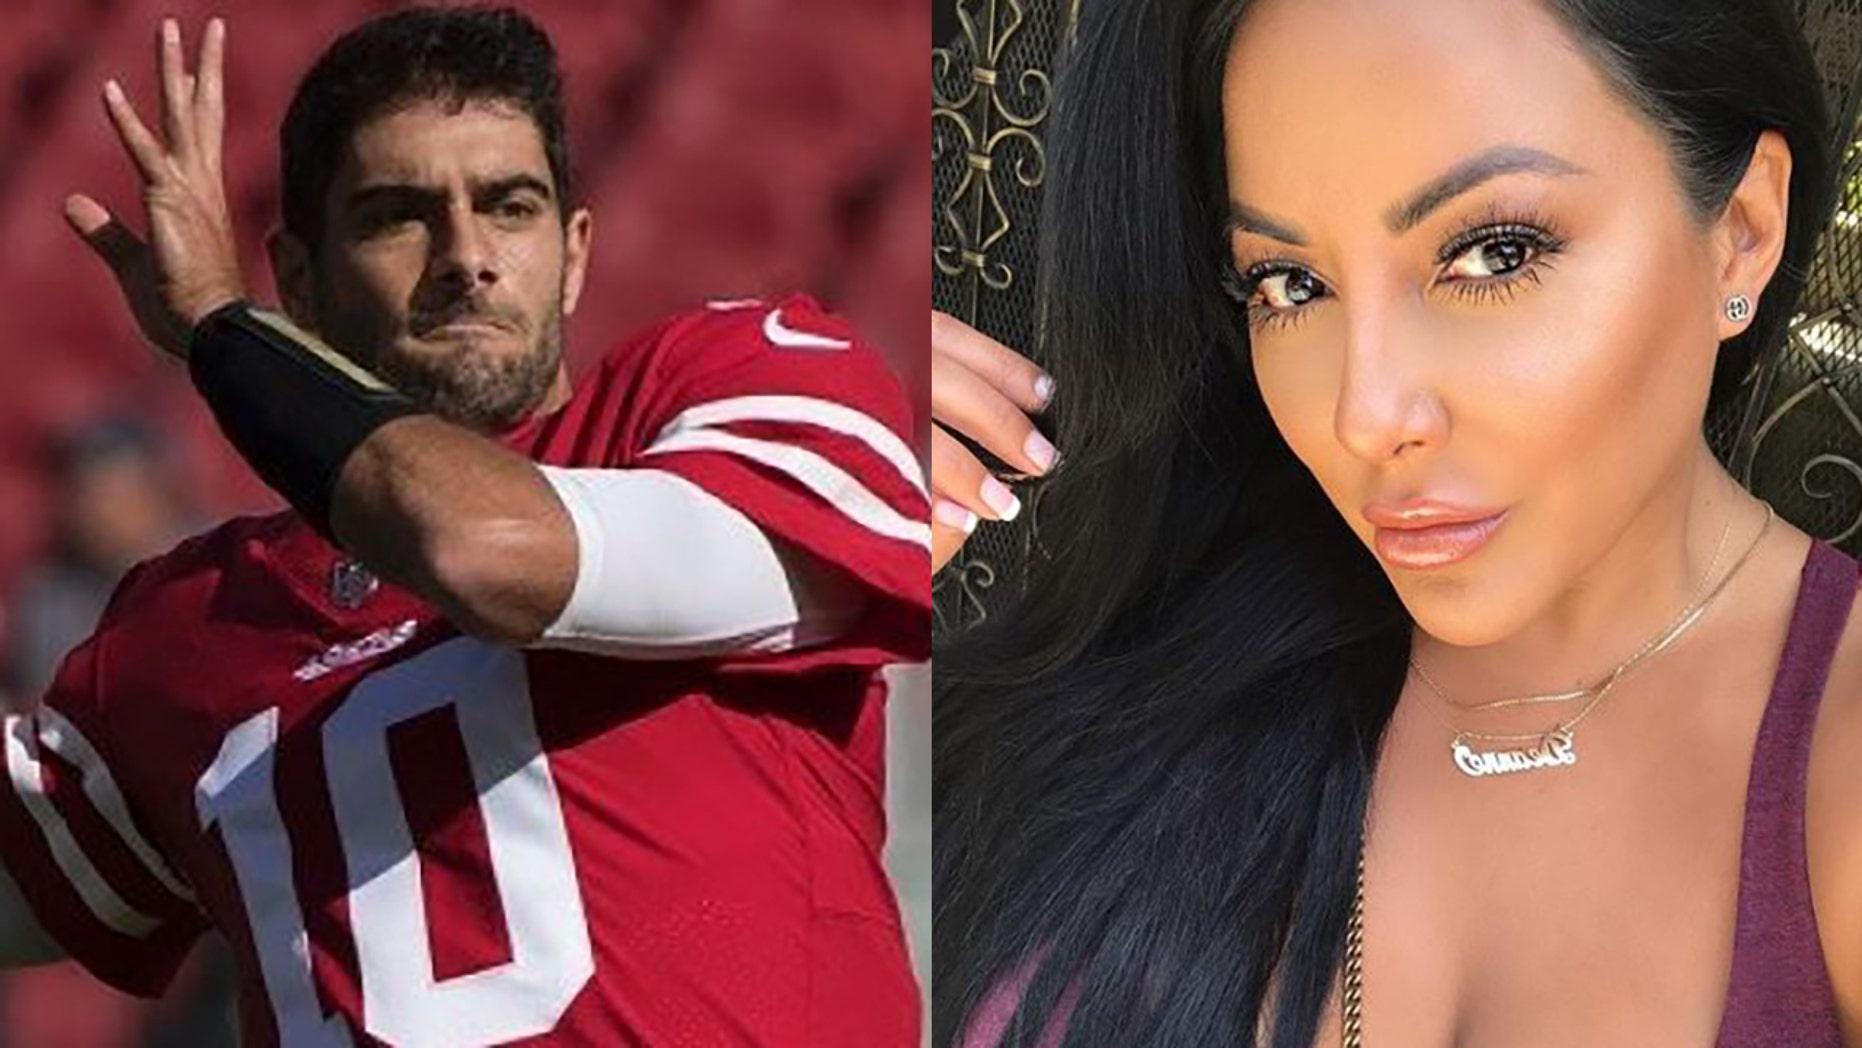 Jimmy Garoppolo Reportedly Went On A Date With Porn Star Kiara Mia